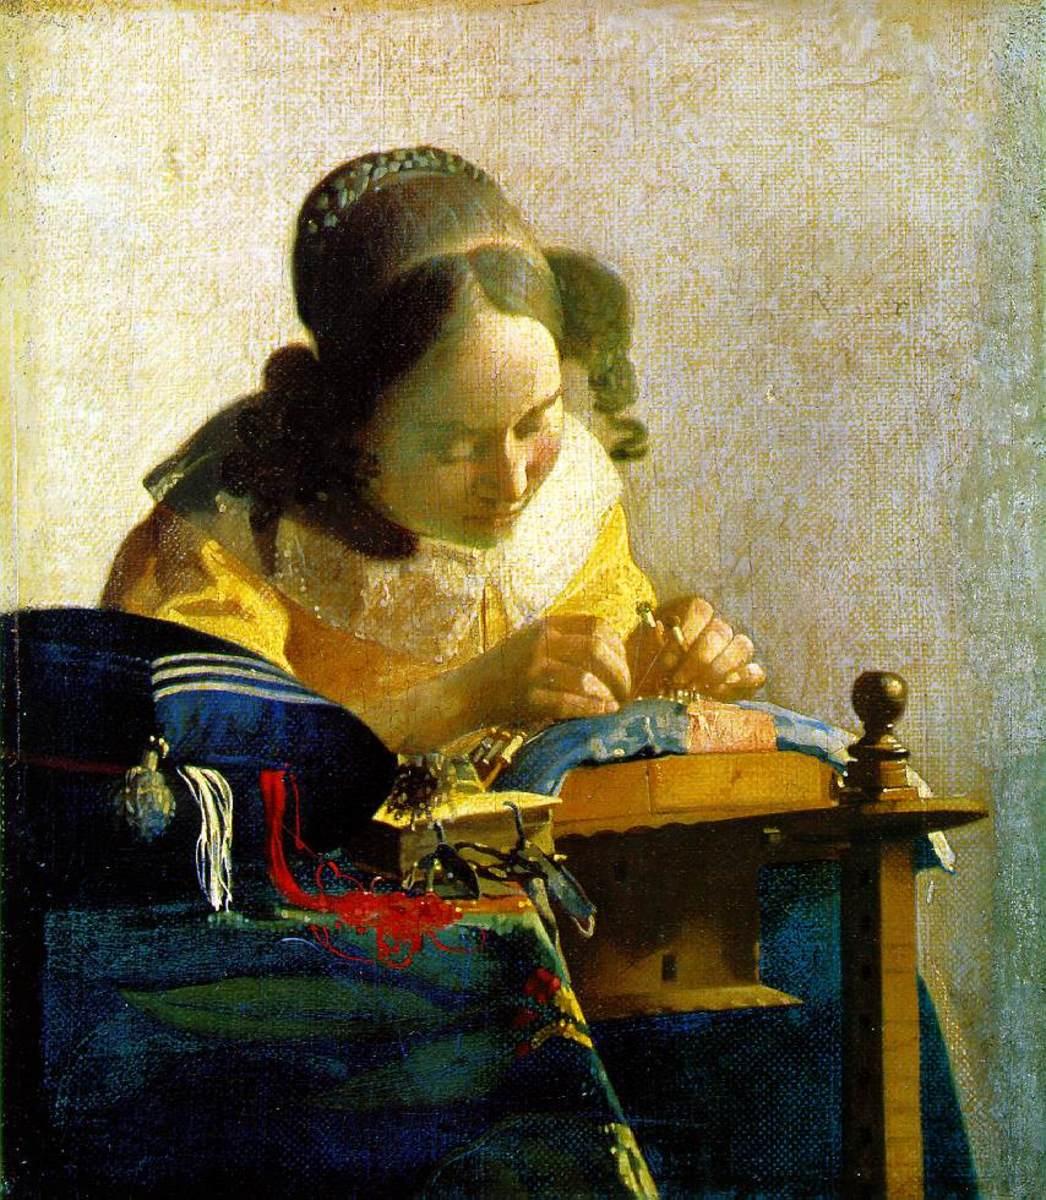 The Lacemaker, Jan Vermeer, painted 1669-70. The Louvre, Paris.